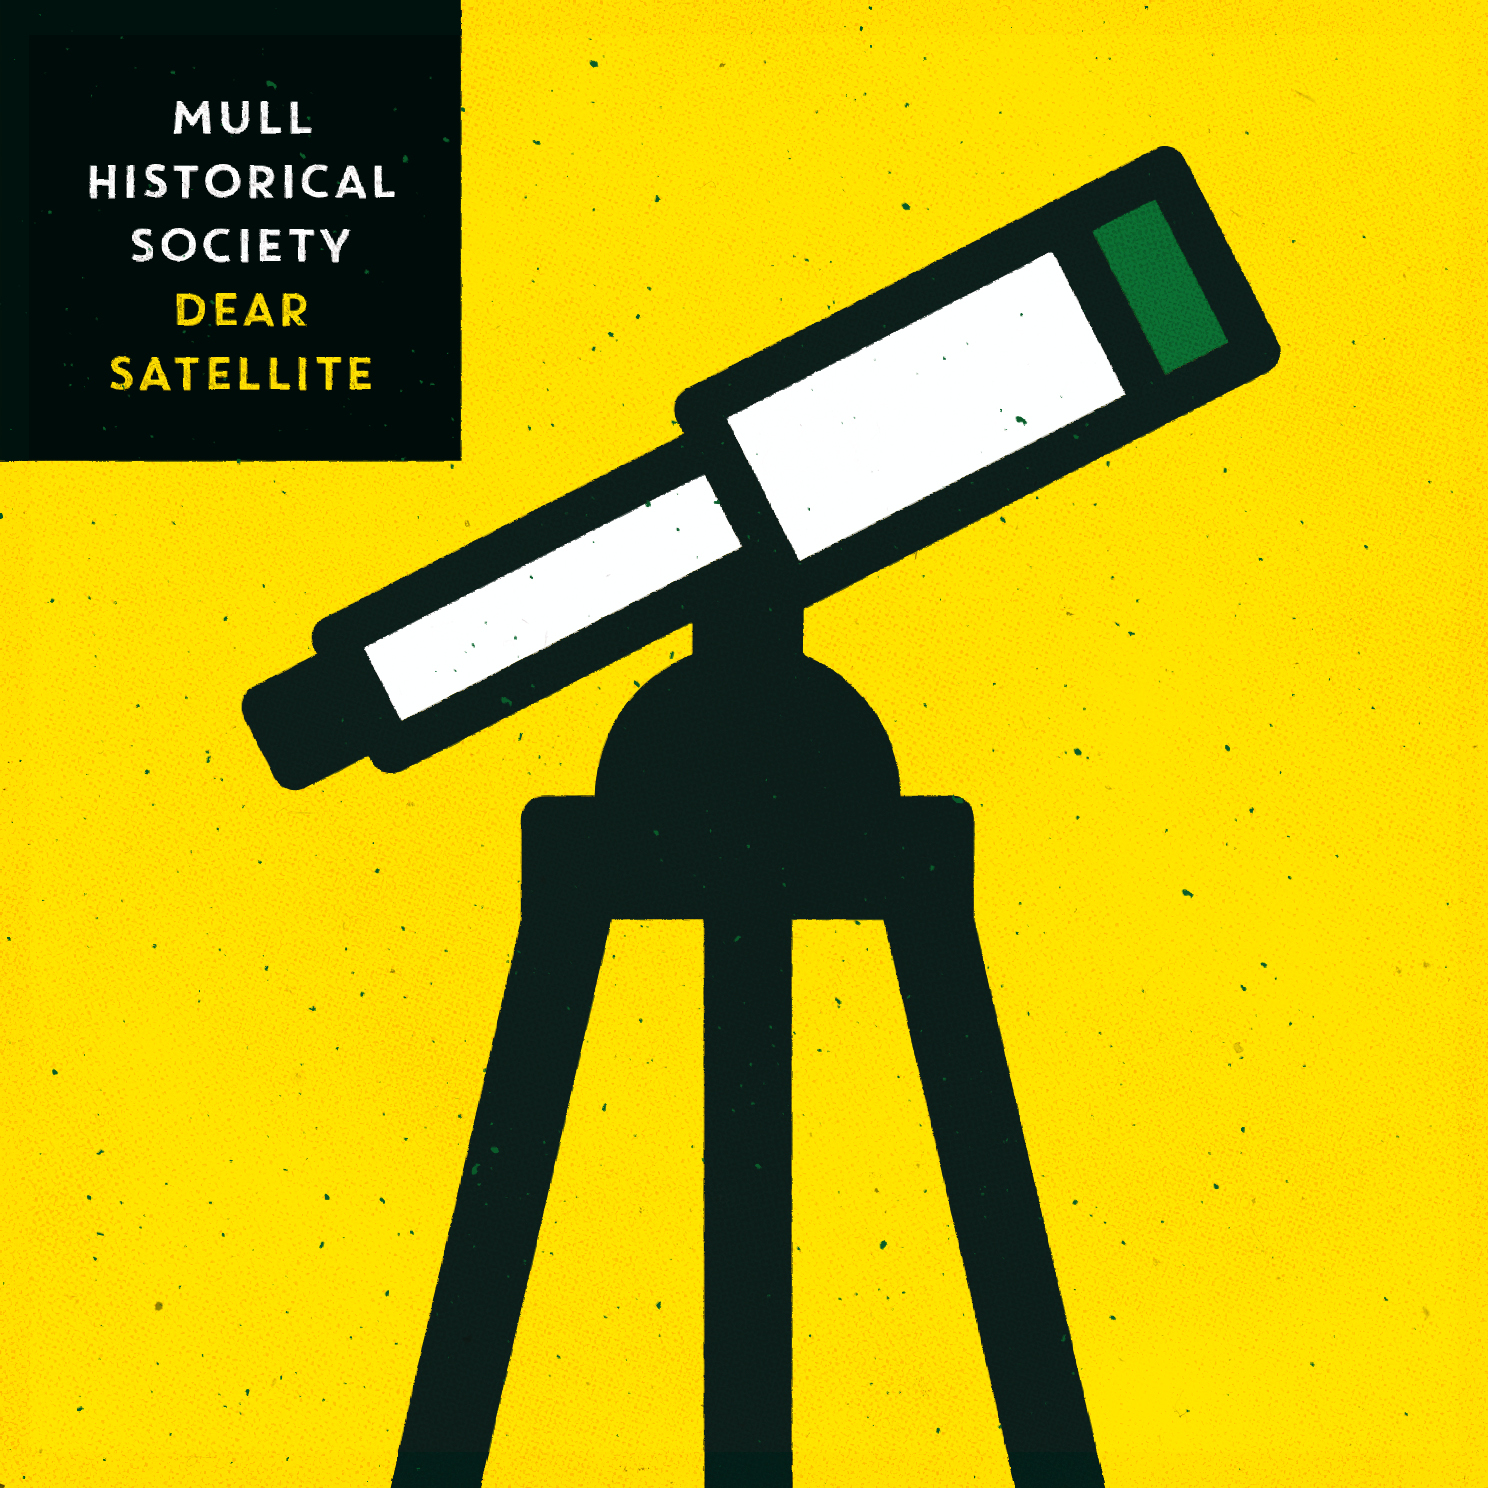 Mull Historical Society – Dear Satellite